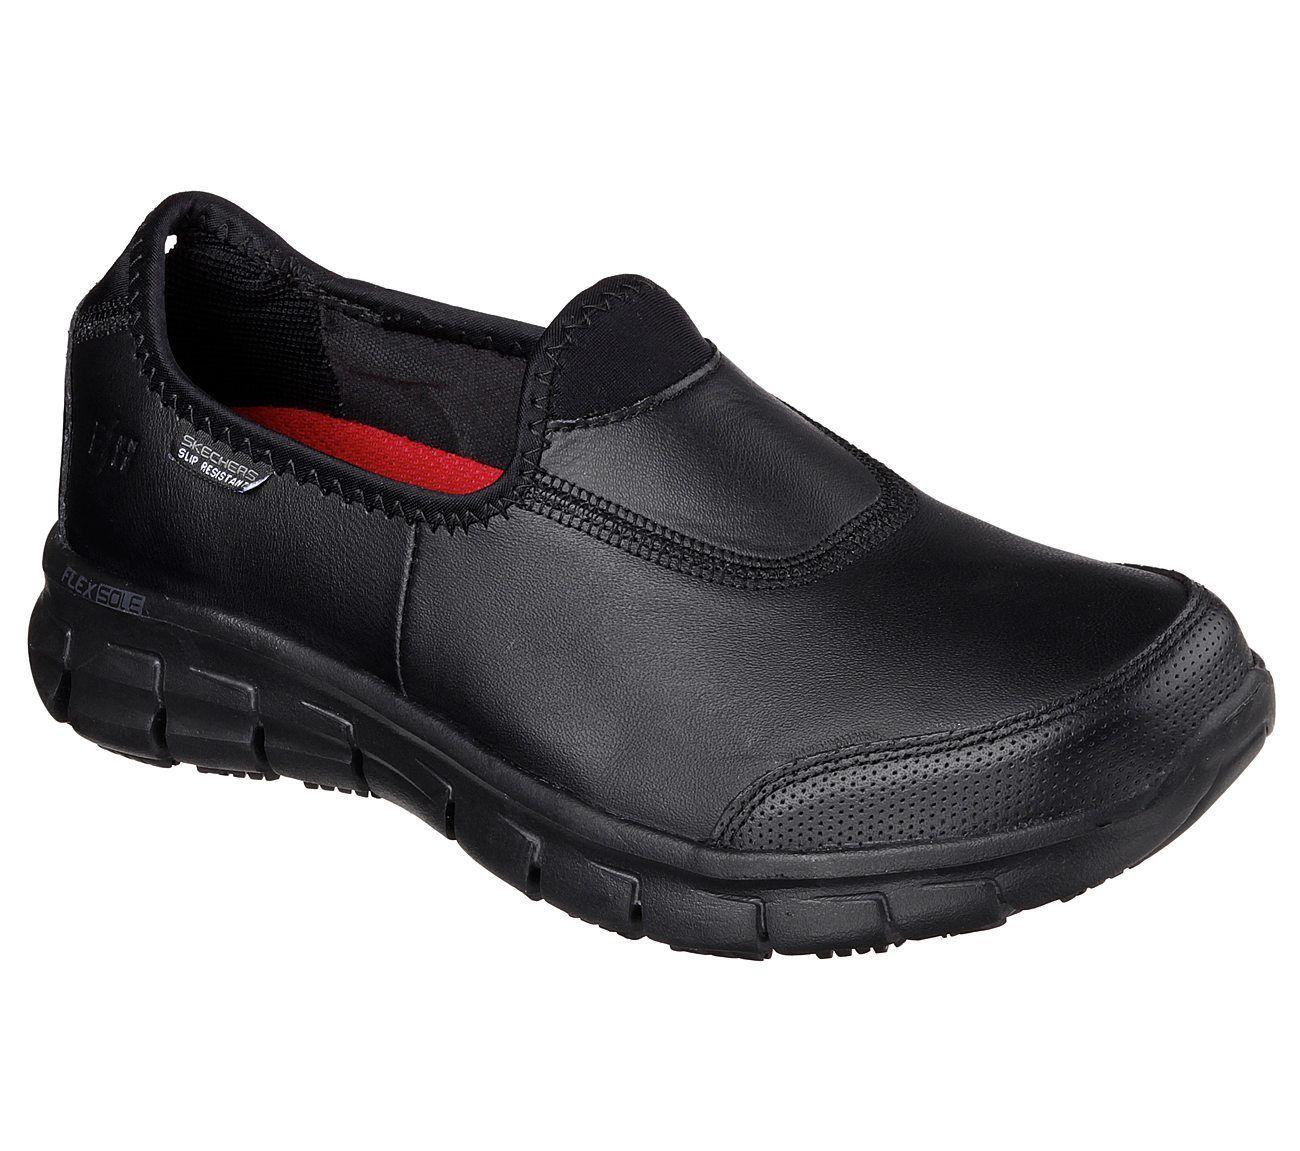 Skechers for Work 76536 Sure Track schwarz ladies NURSE work shoe sz 3-8 NURSE ladies SECURITY ba4cba